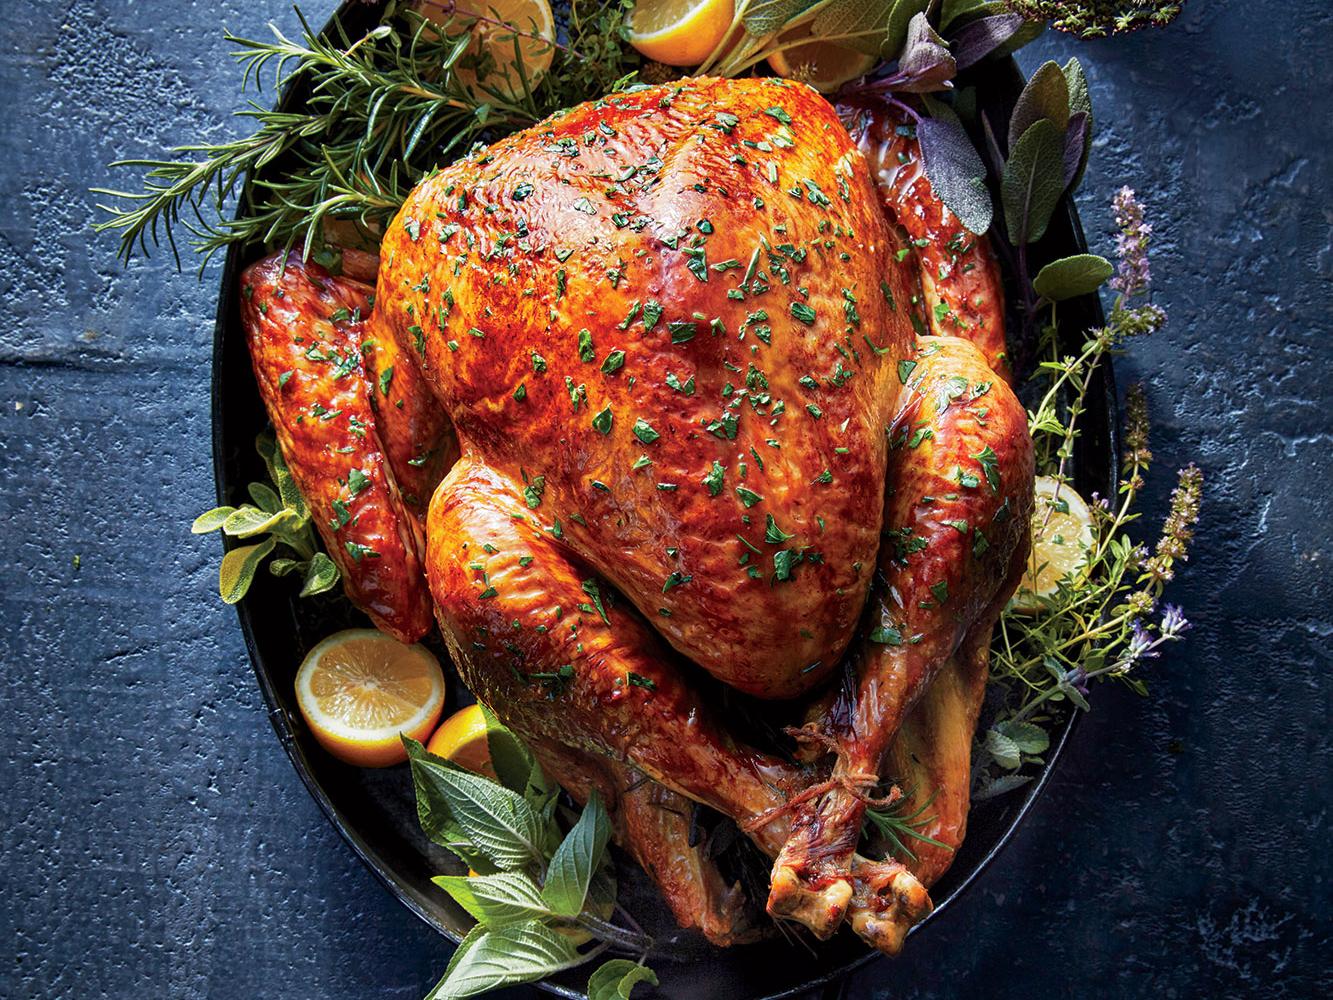 Herb, Lemon, and Garlic Turkey